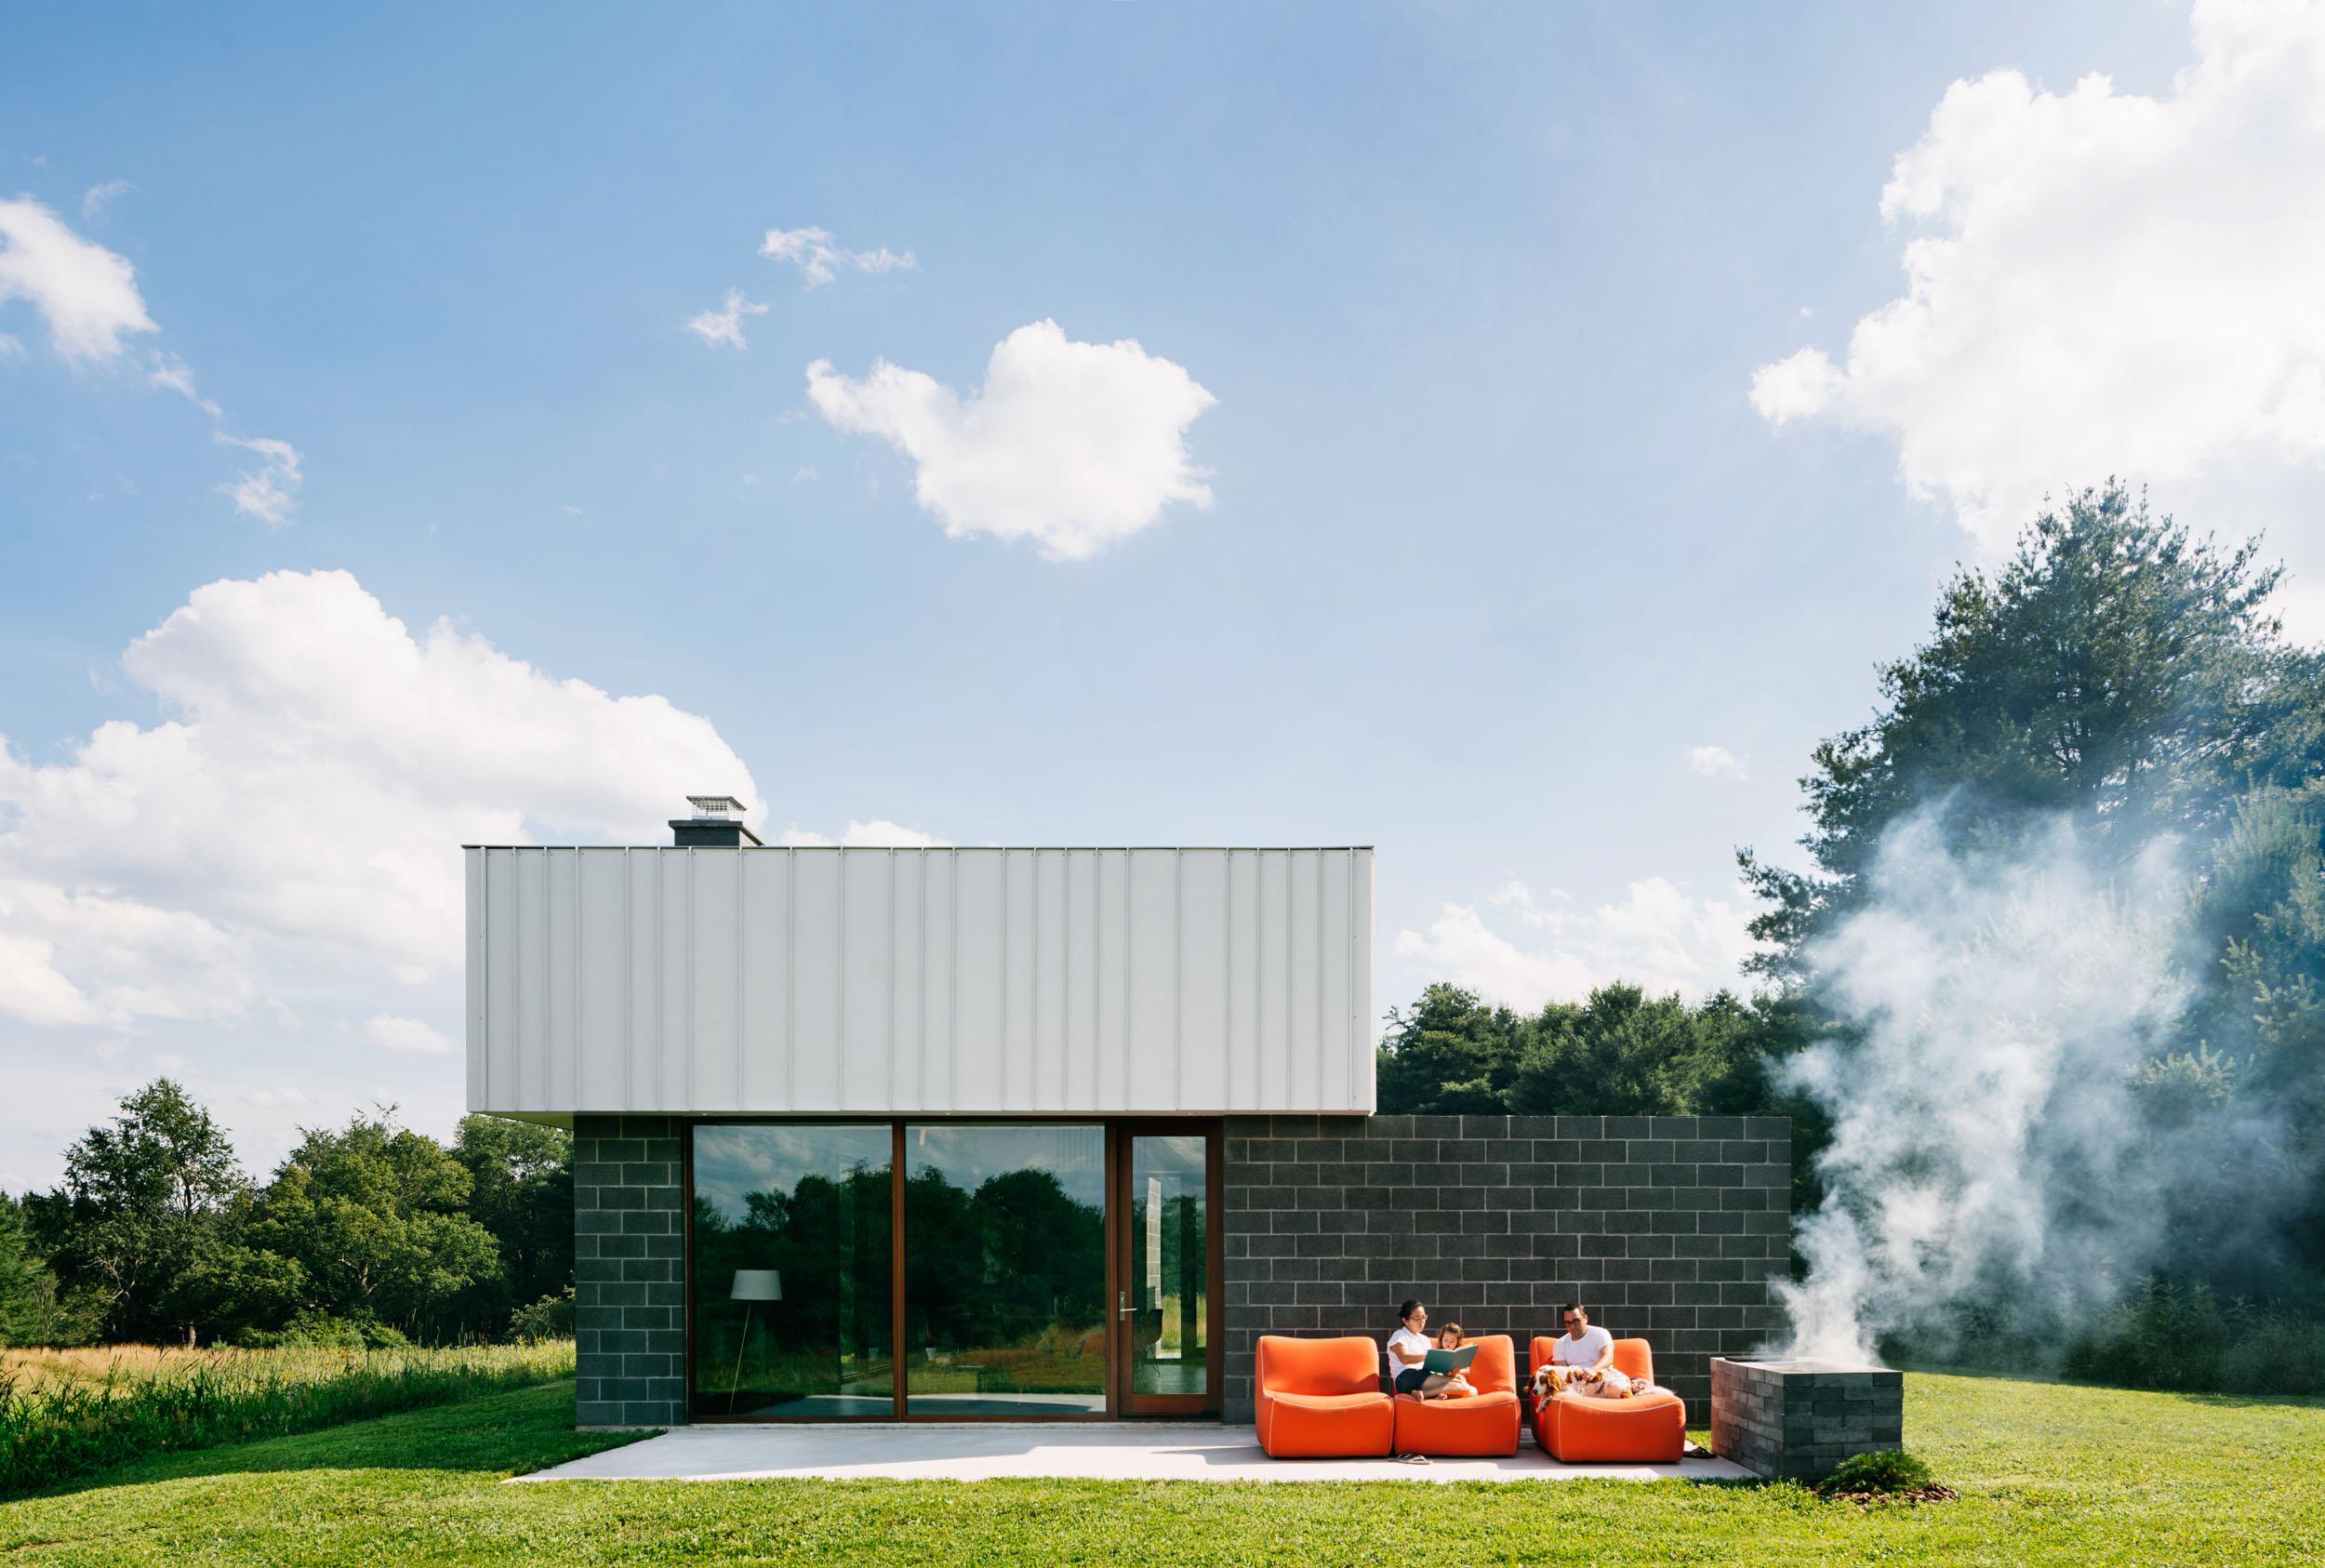 White Lake House Catskills, NY J_spy Architecture